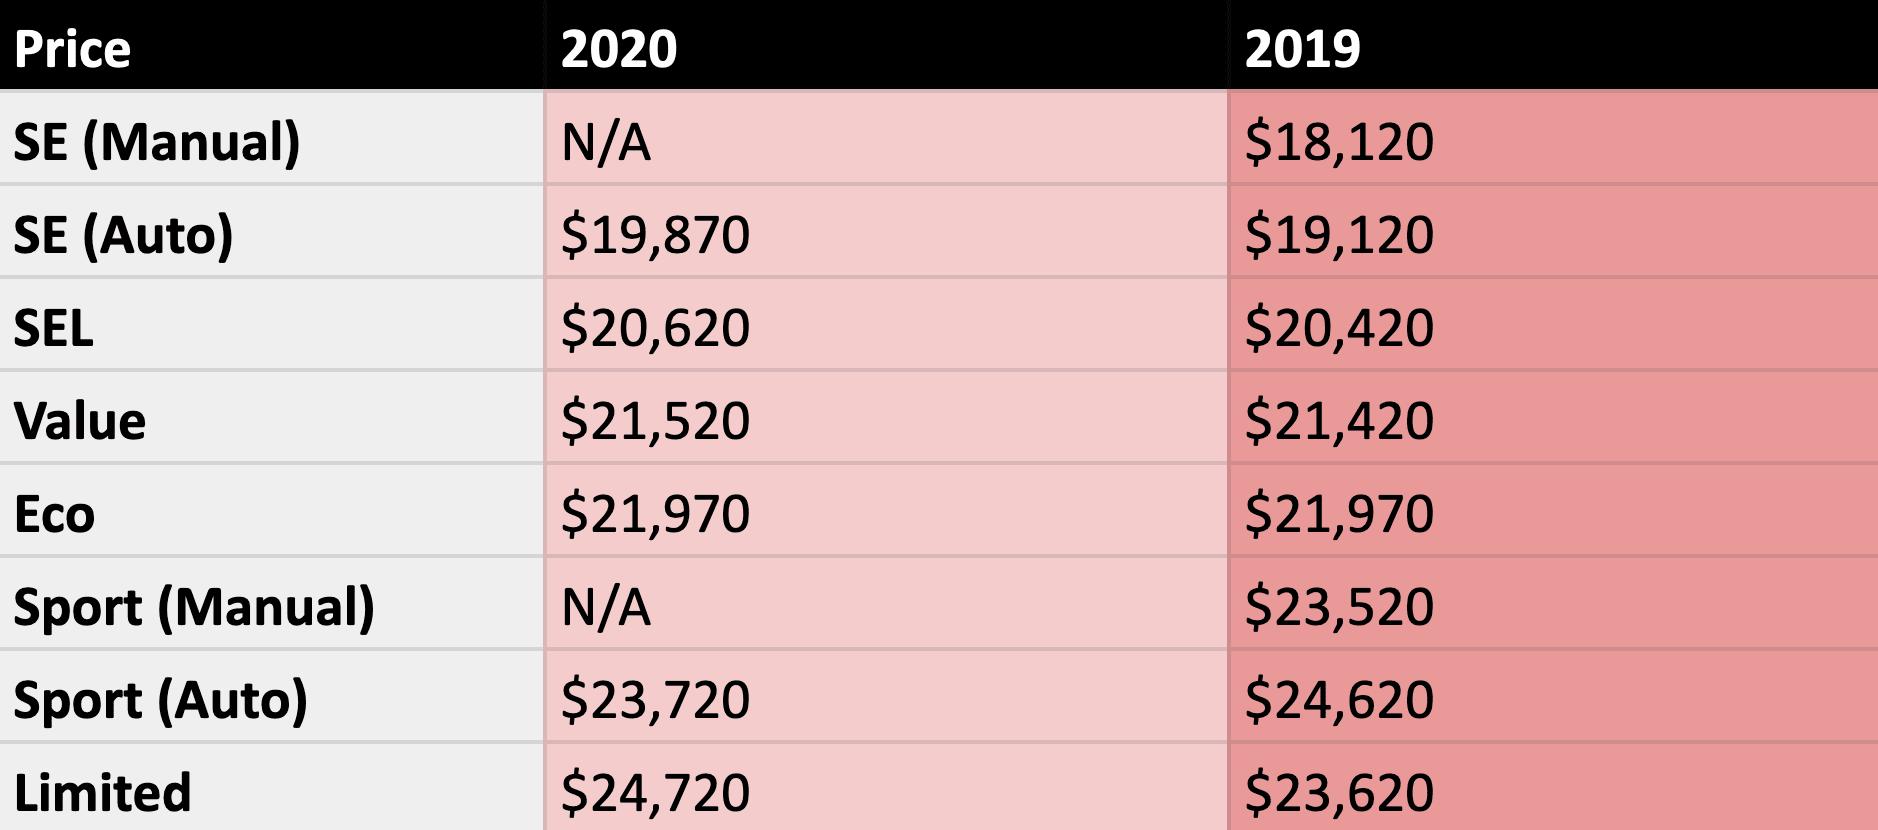 2020 Hyundai Elantra Pricing